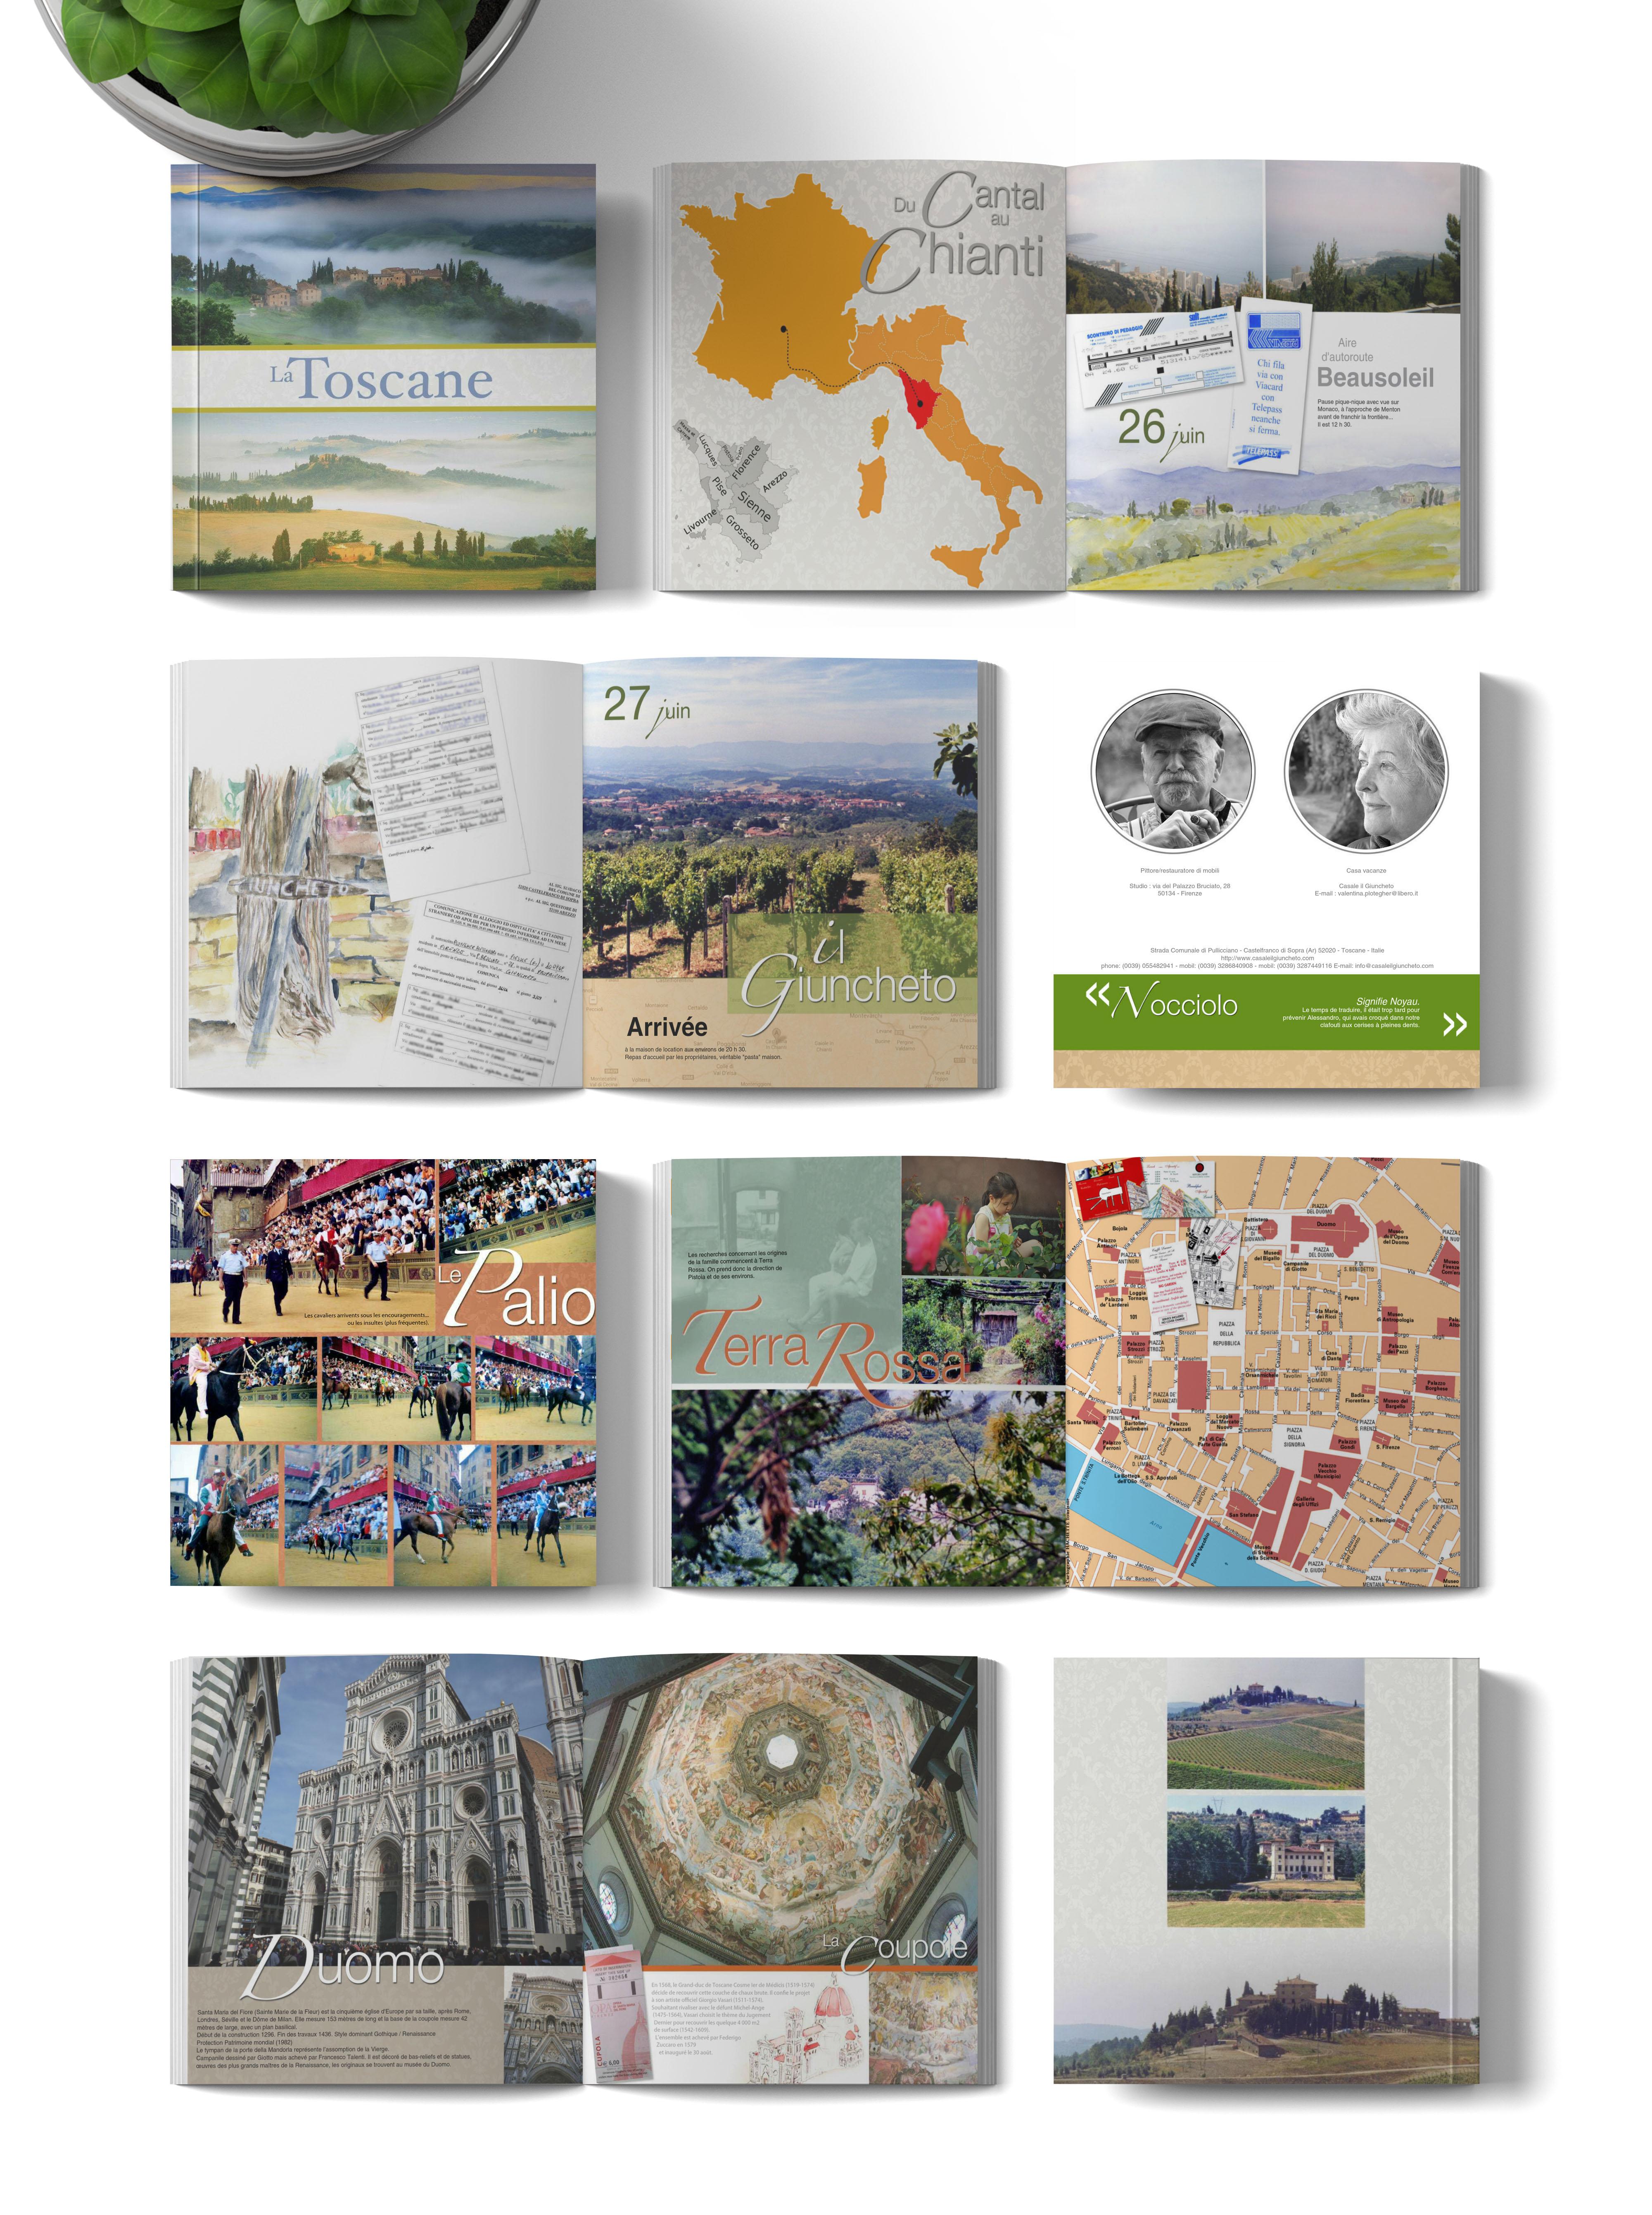 Pages du livre Toscane